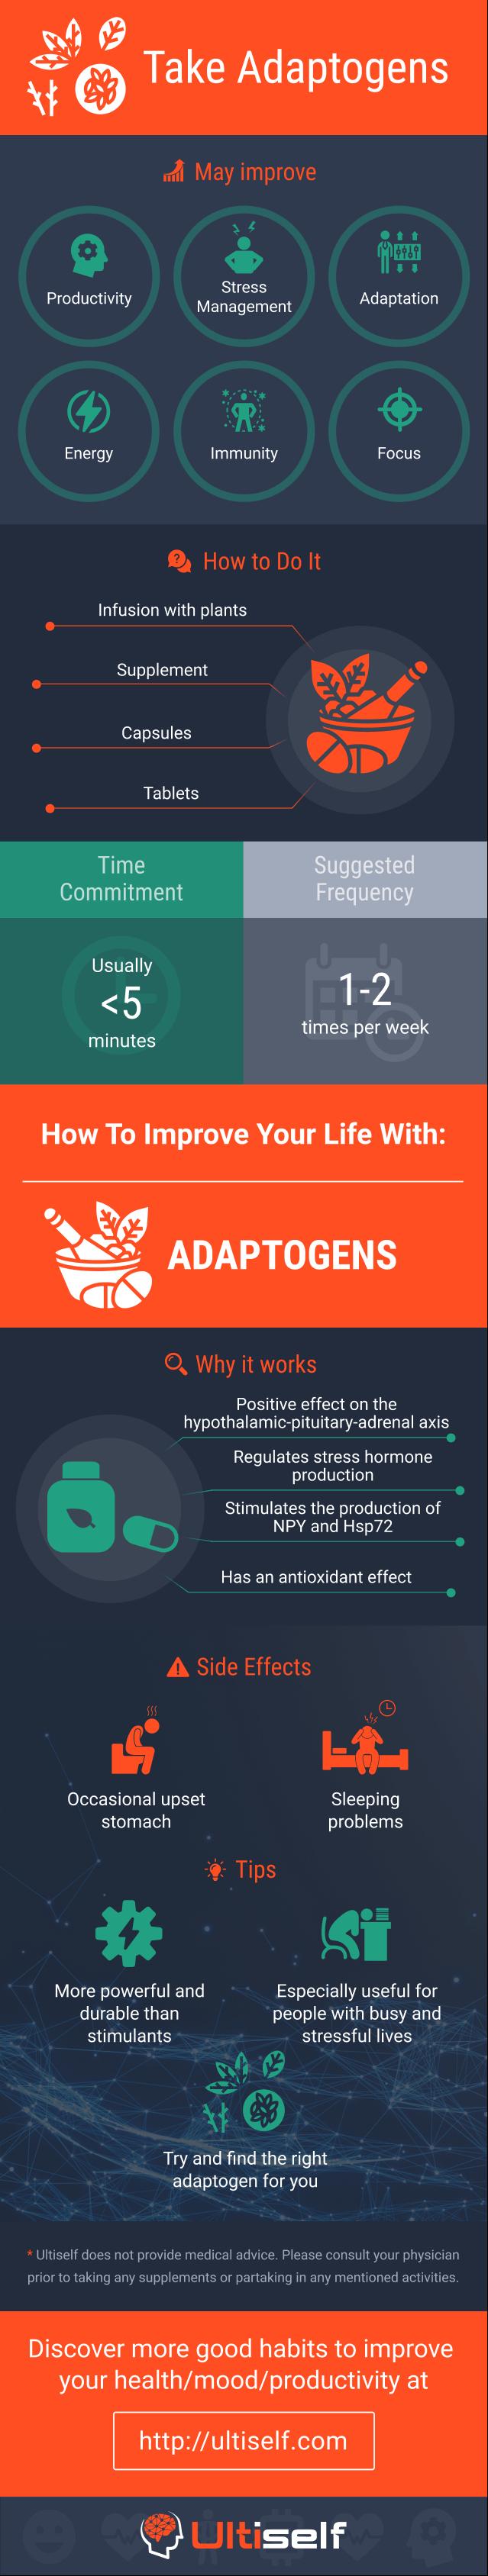 Take Adaptogens infographic